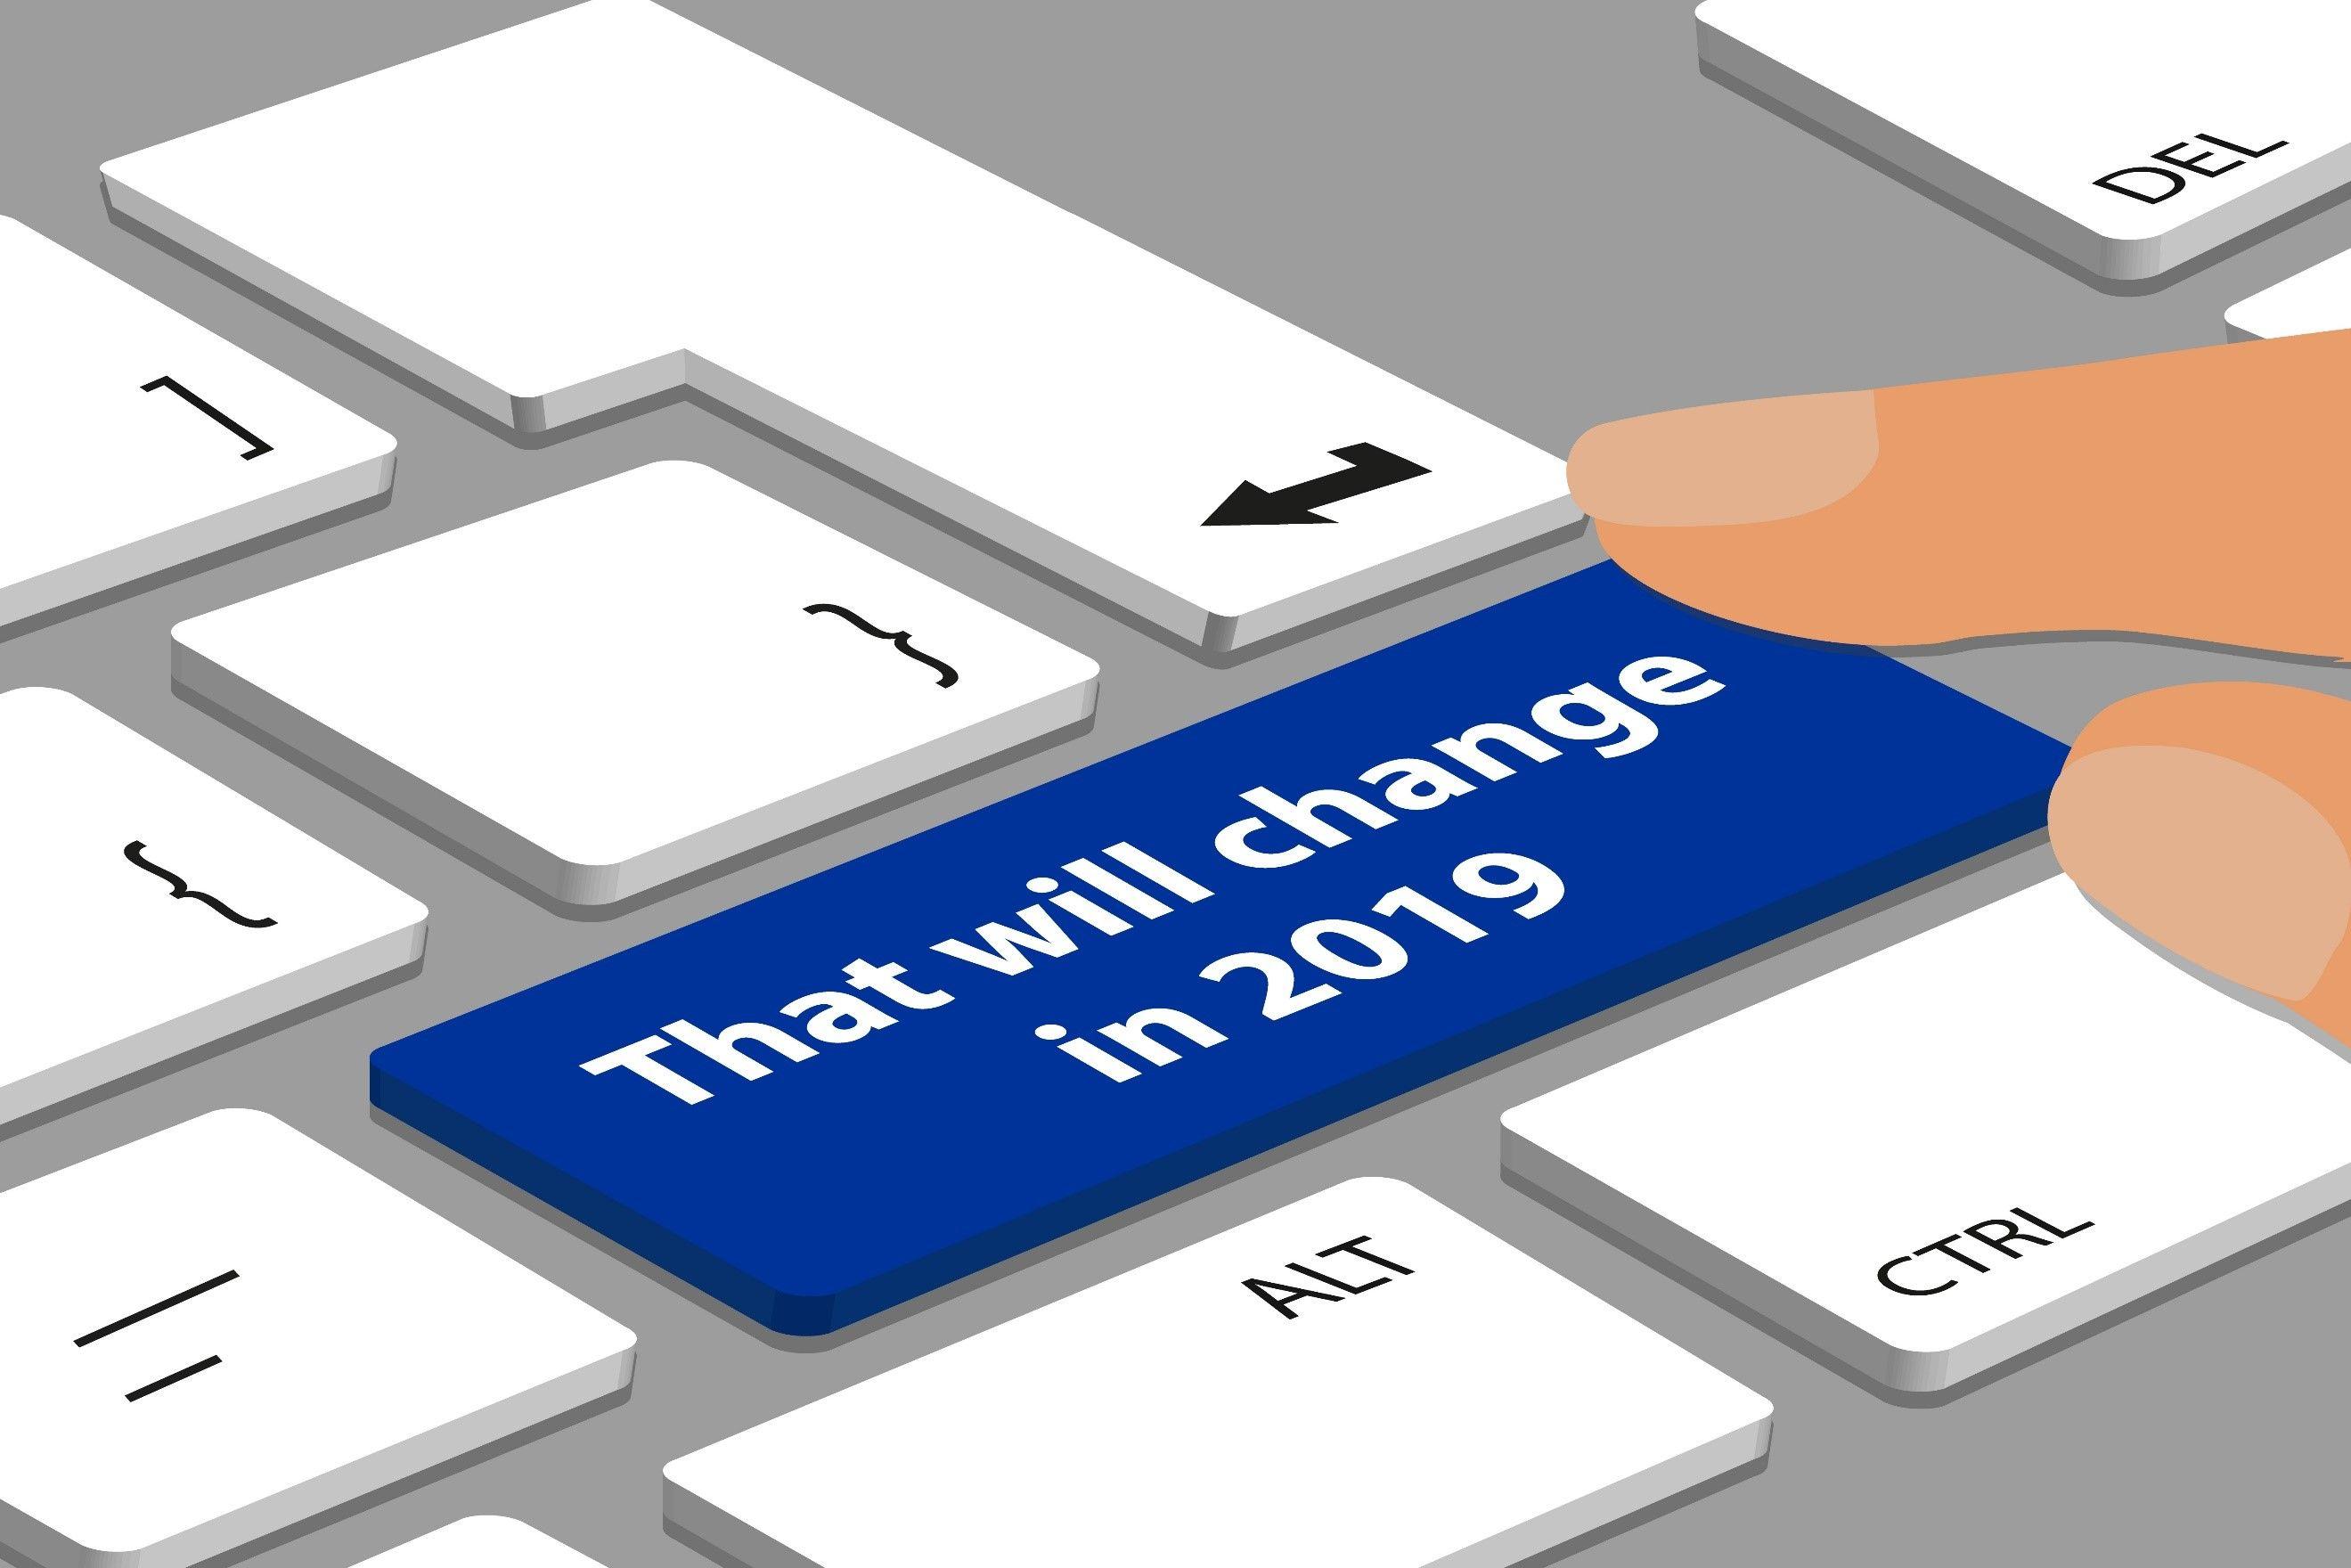 digital_change_2019